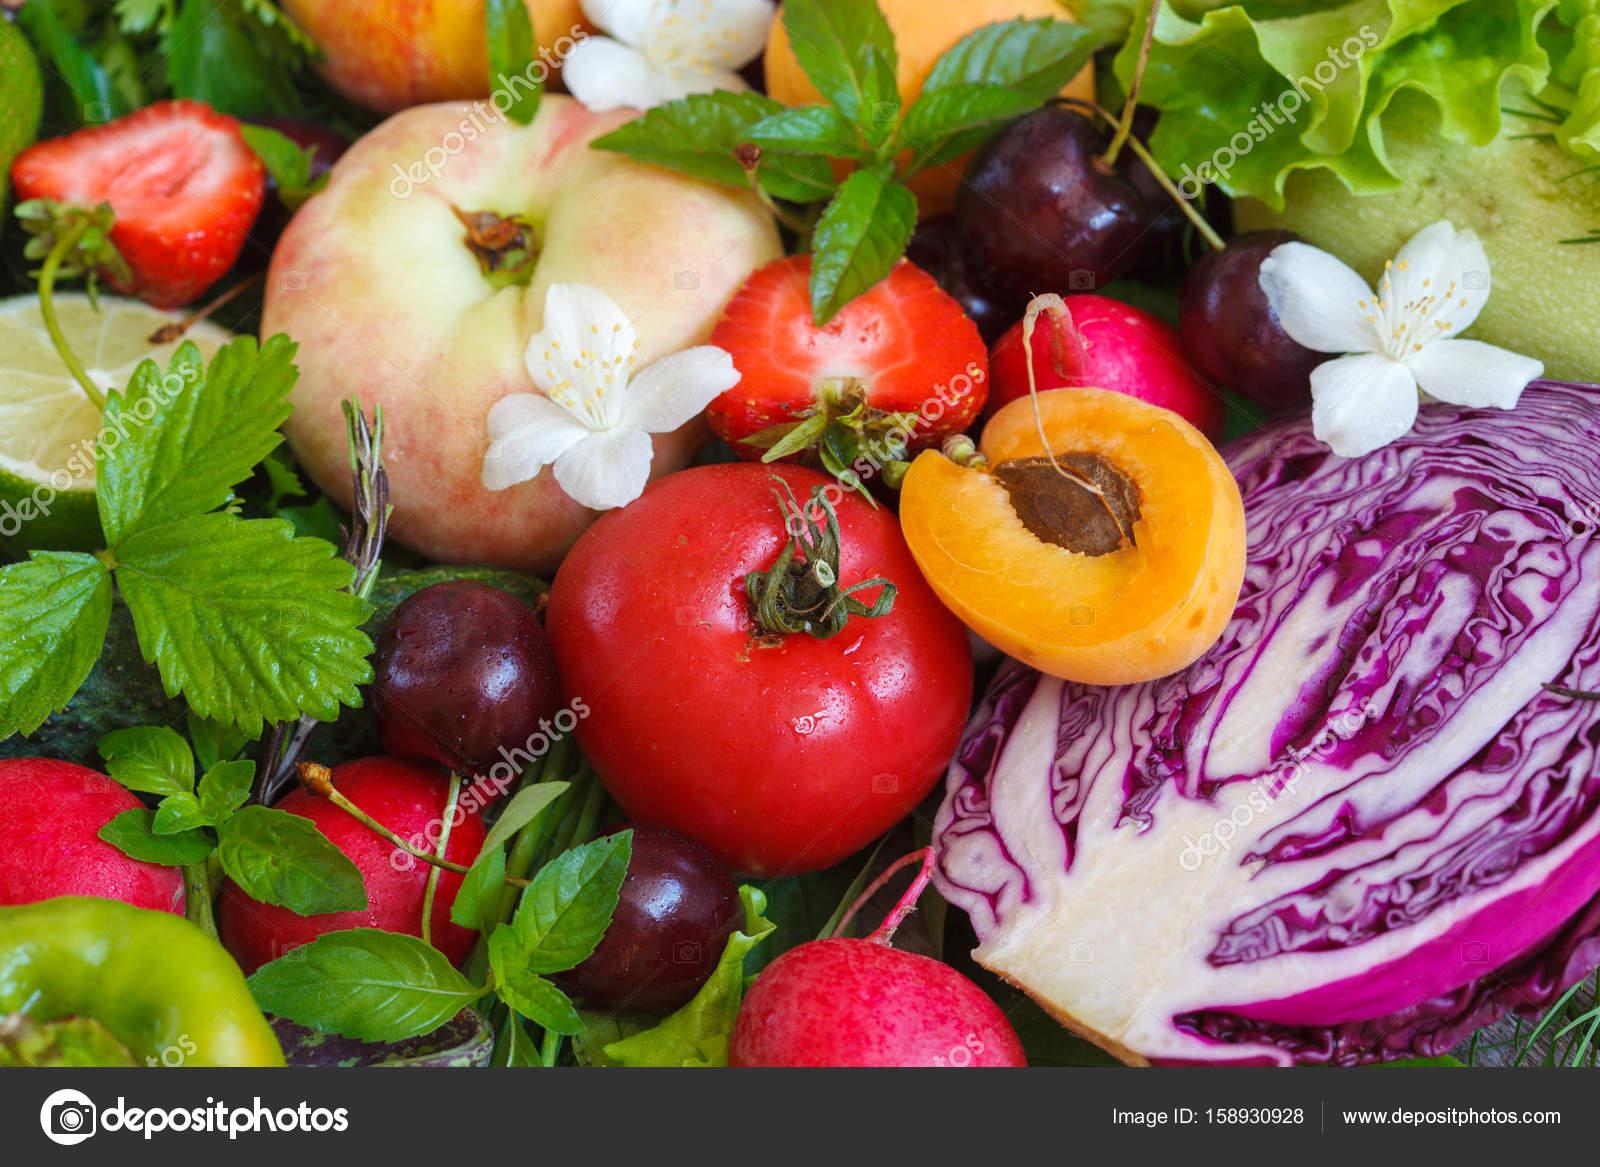 0ecf35fc755 Καλοκαιρινά φρούτα και λαχανικά — Φωτογραφία Αρχείου © vaaseenaa ...